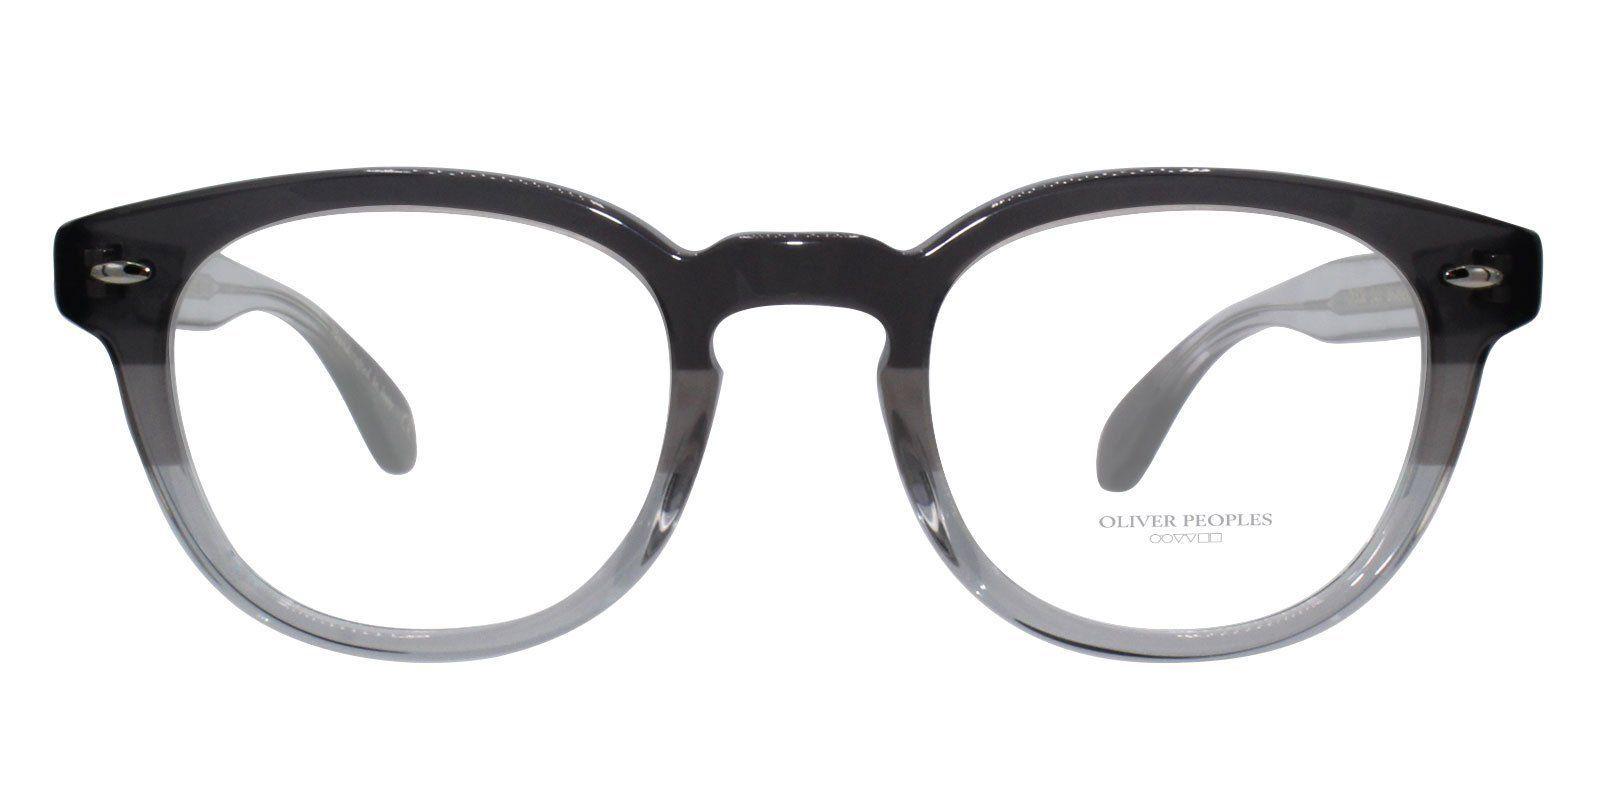 2a7ddc740b Oliver Peoples - Sheldrake Gray eyeglasses in 2019